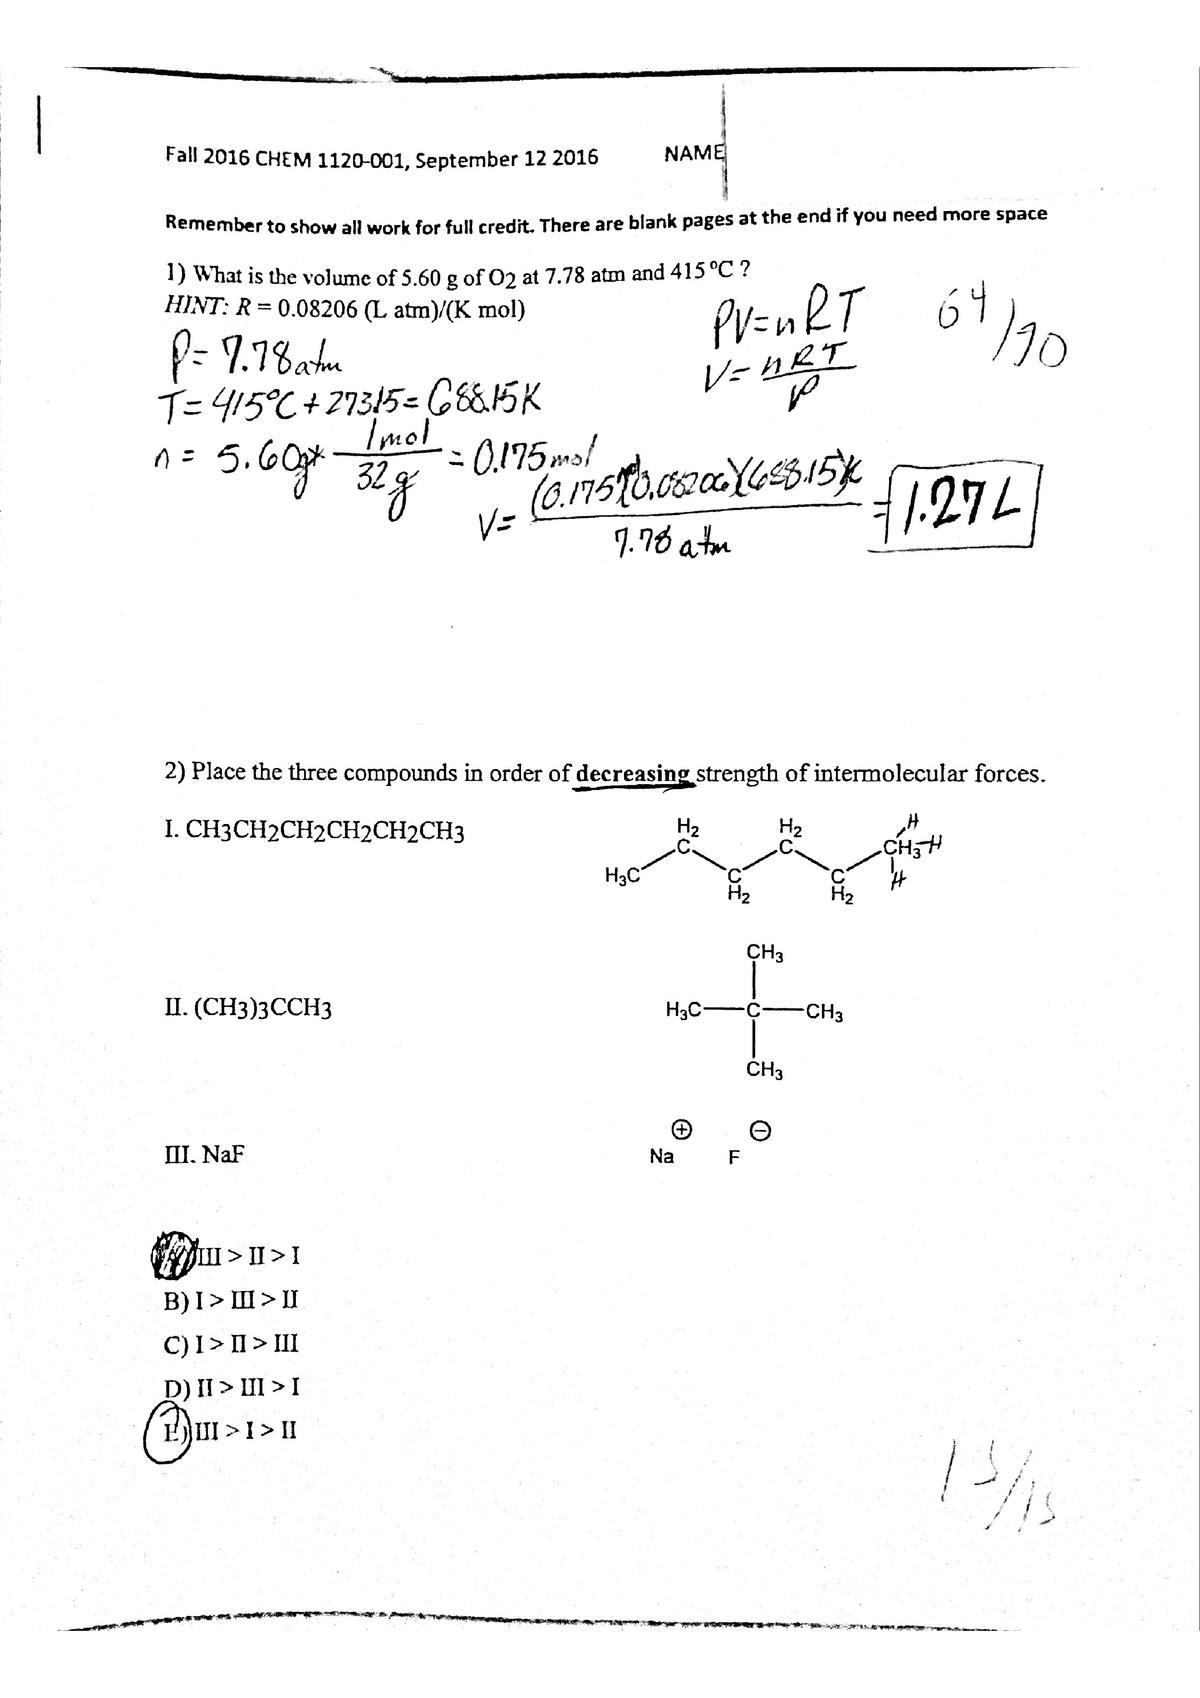 Exam 2016 - CHEM 1120: General Chemistry Ii - StuDocu